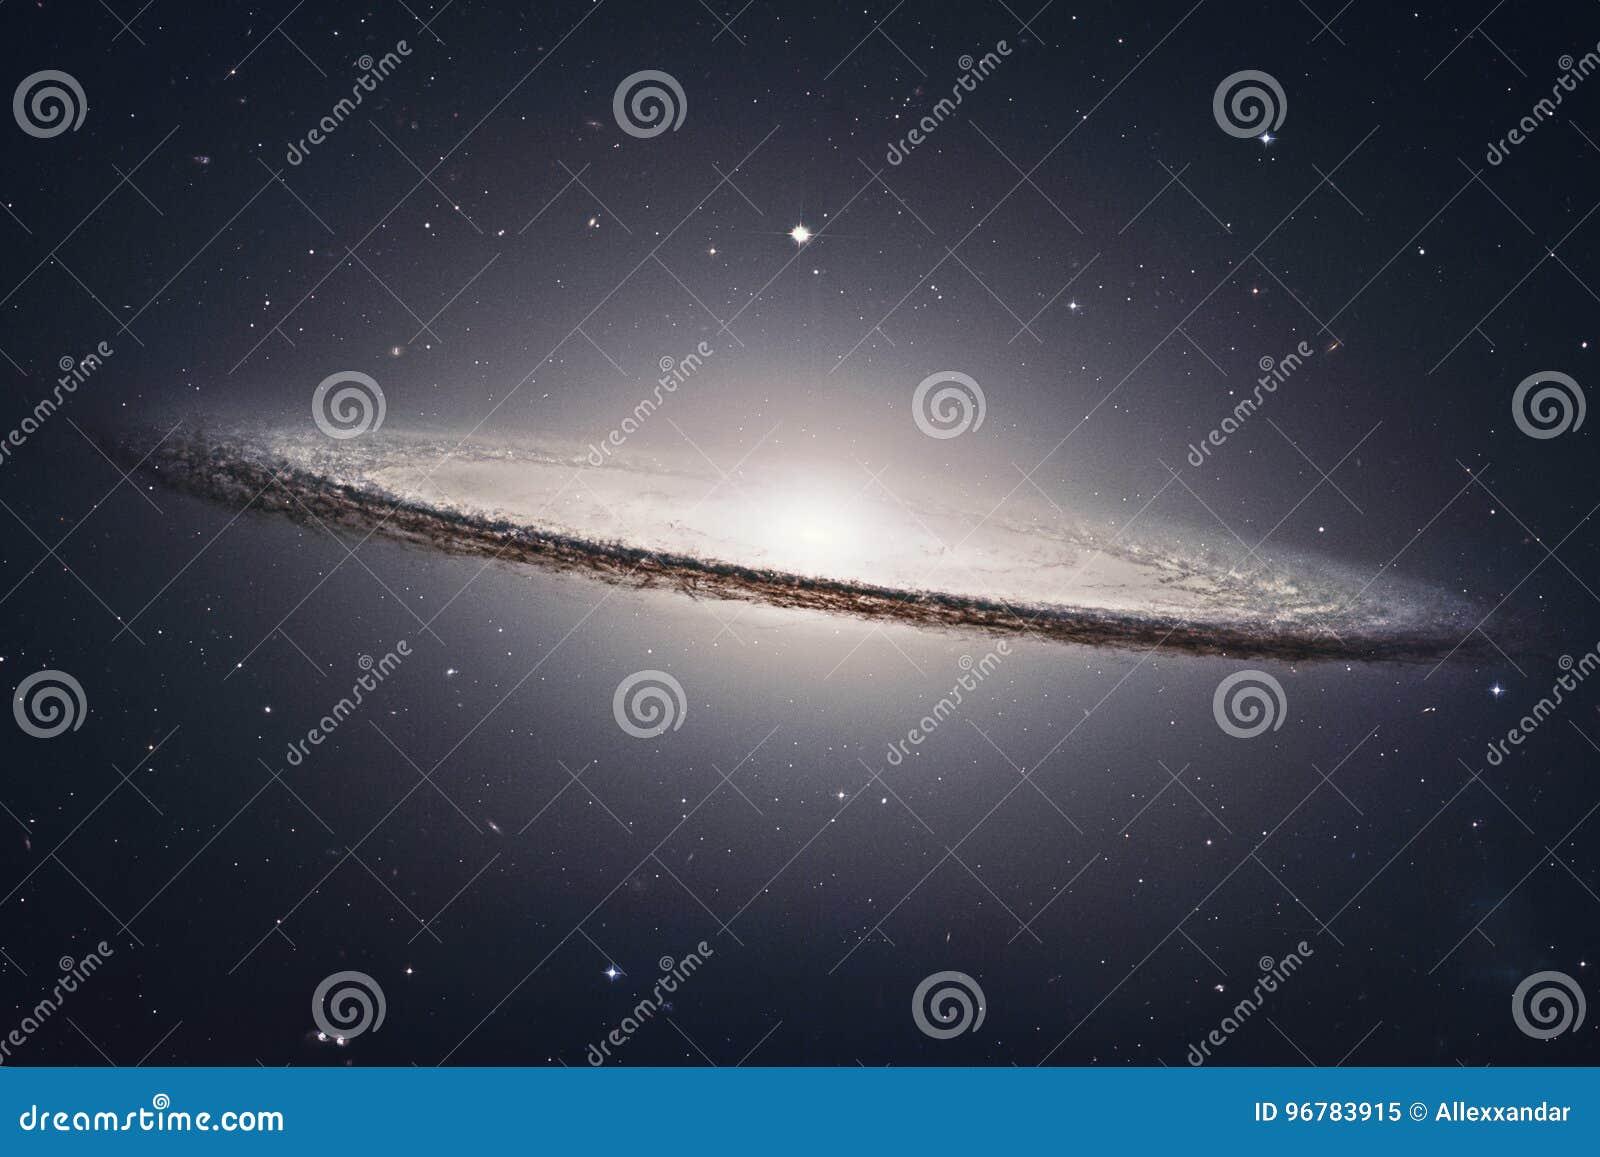 Sombrero Galaxy M104 In Constellation Virgo Stock Image Image Of